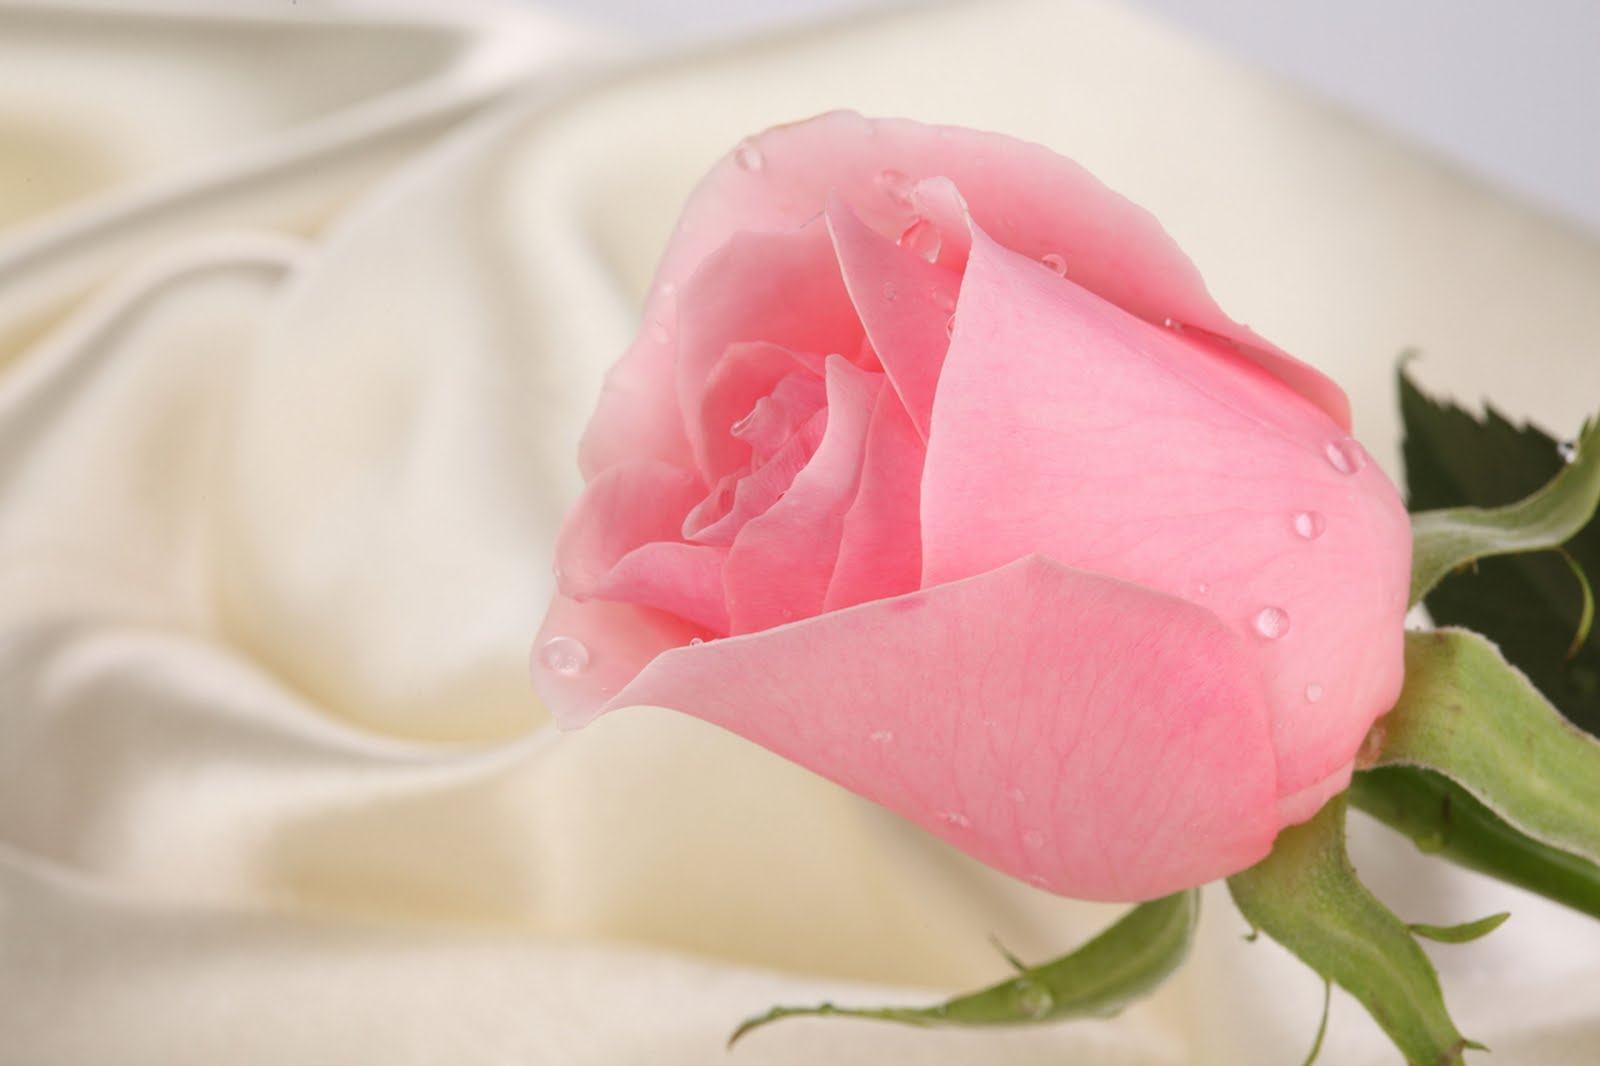 Beautiful Ping Rose Wallpaper Desktop Very Nice Enliven HD Wallpa